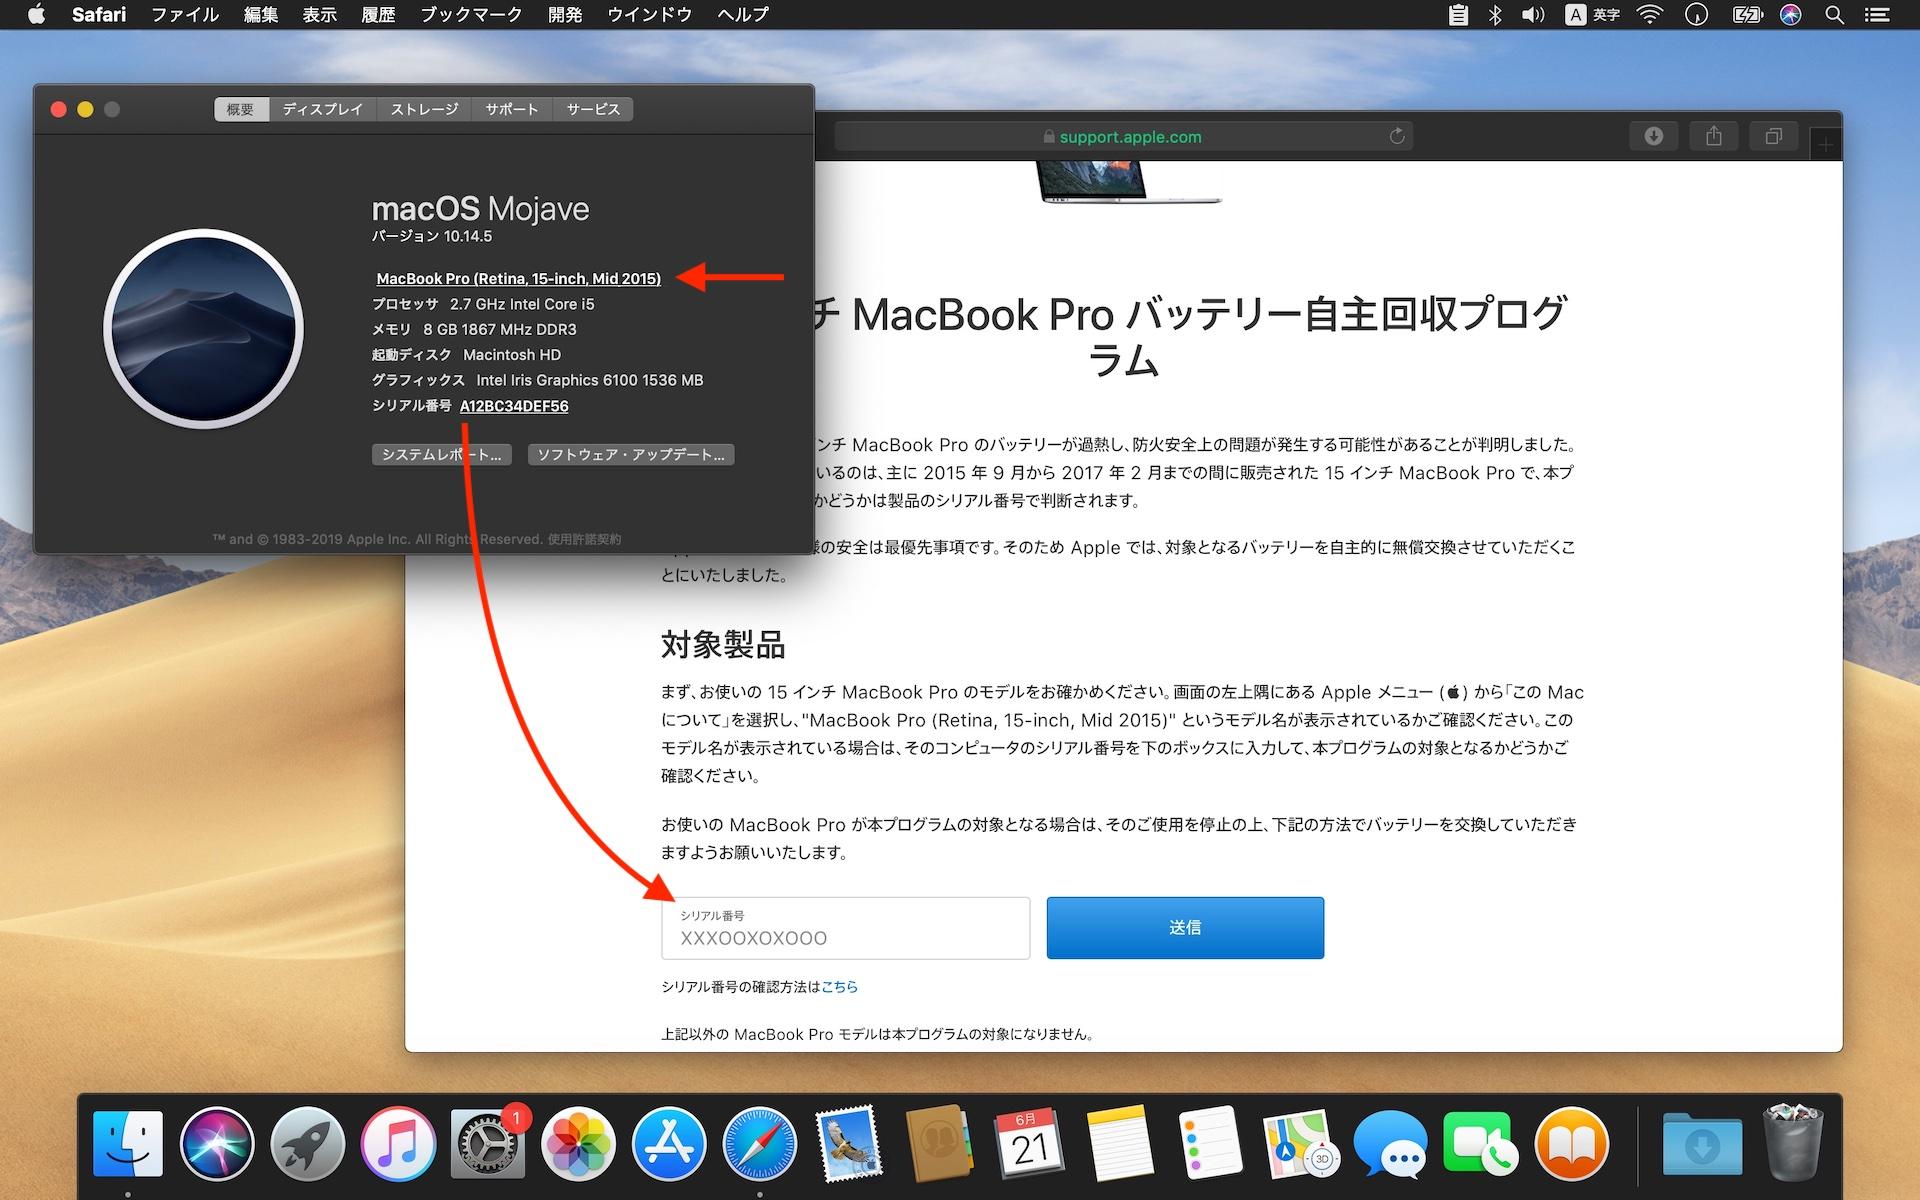 MacBook Pro (Retina, 15-inch, Mid 2015)のシリアル番号